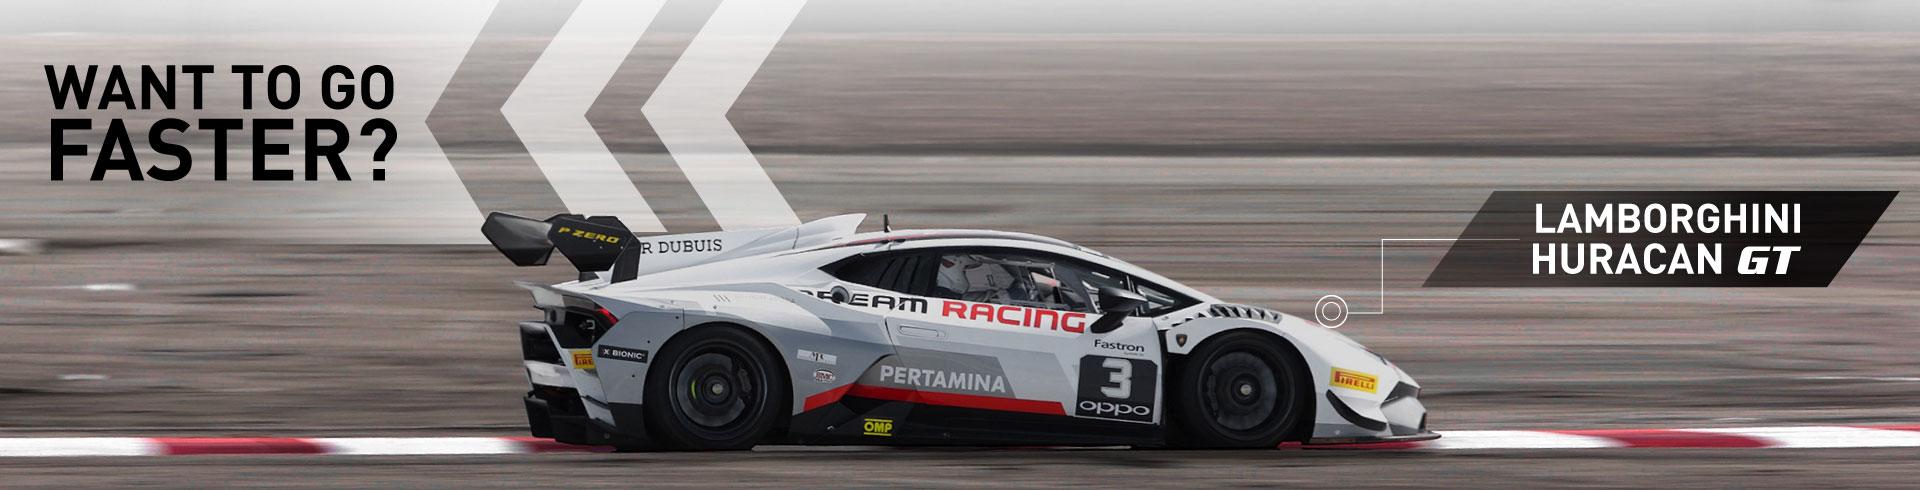 Dream Racing Driving Experience At Las Vegas Motor Speedway Dream